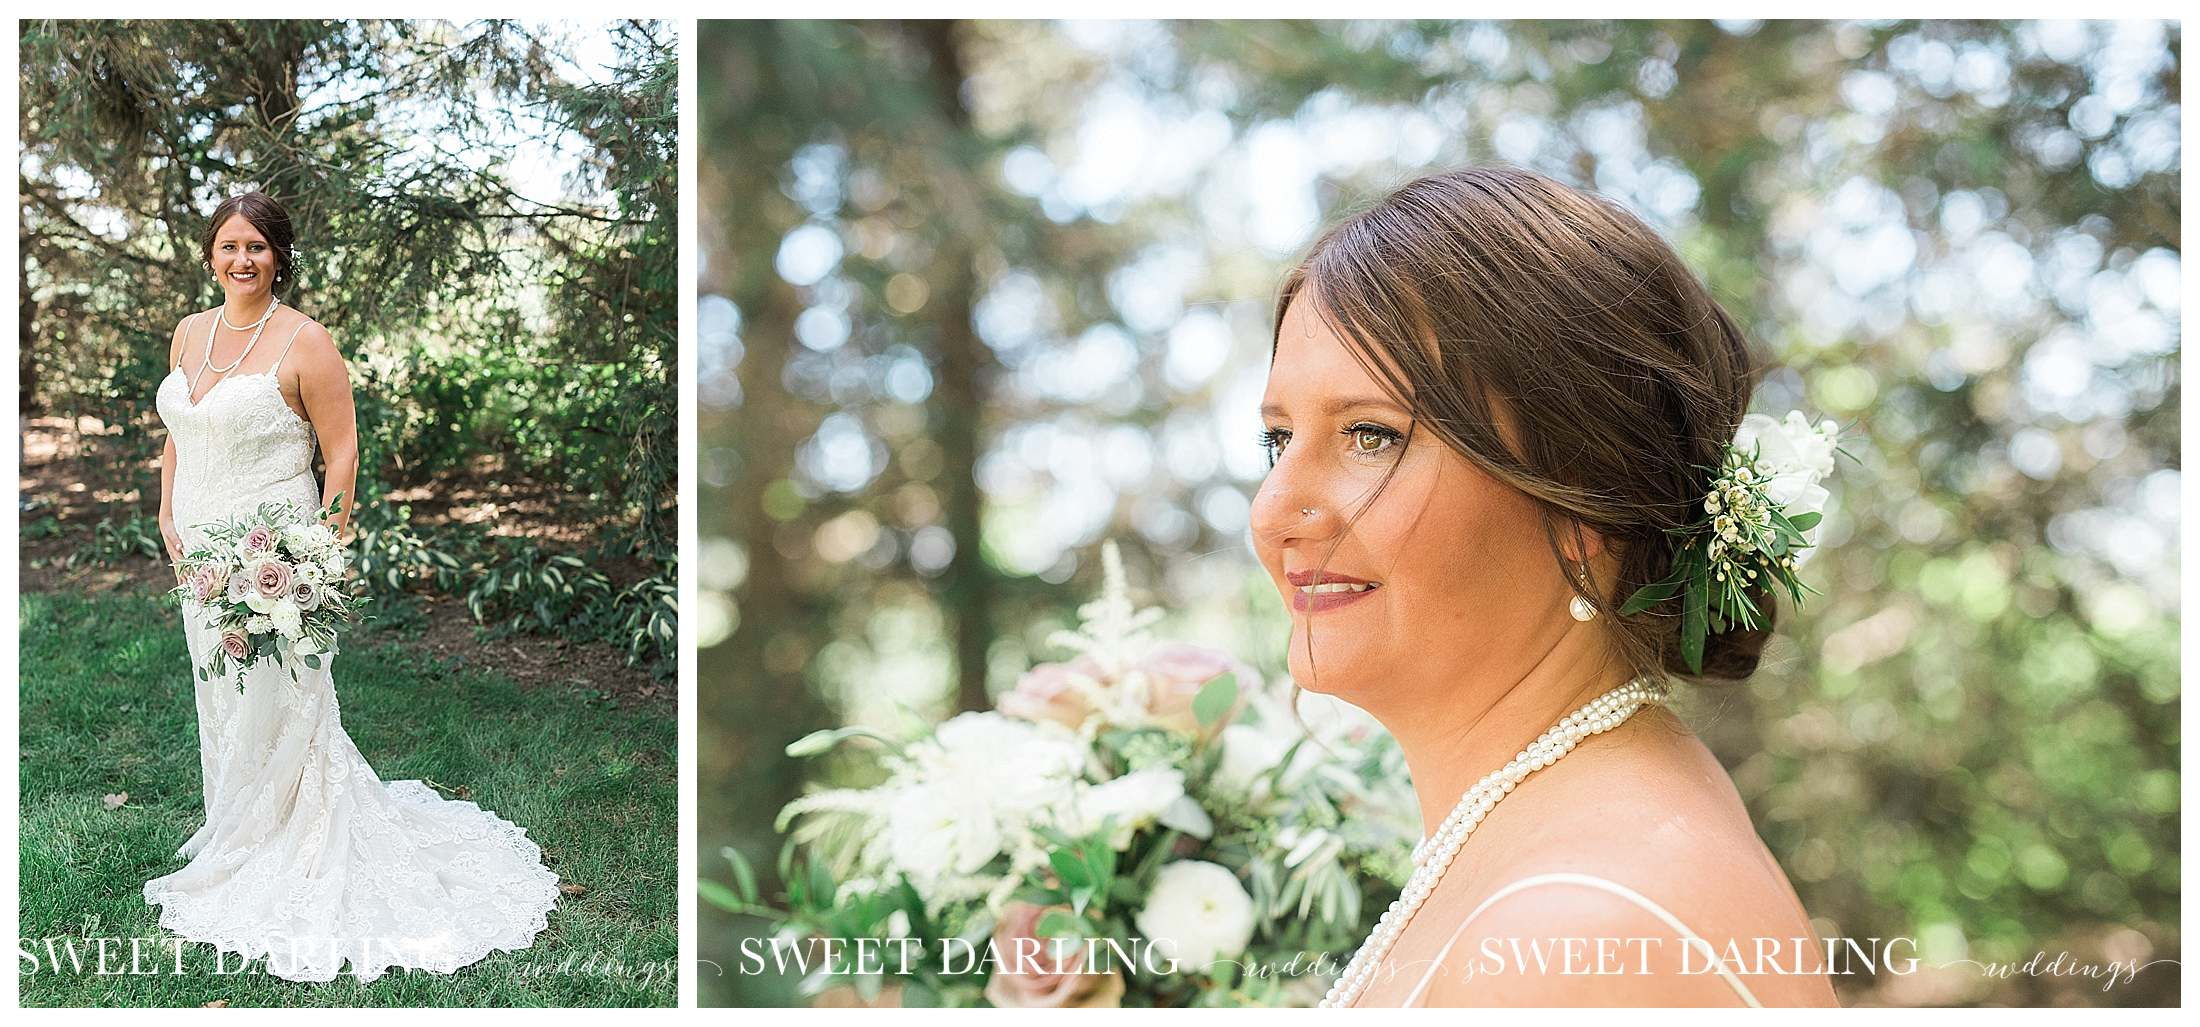 Beautiful bride in pearls central illinois